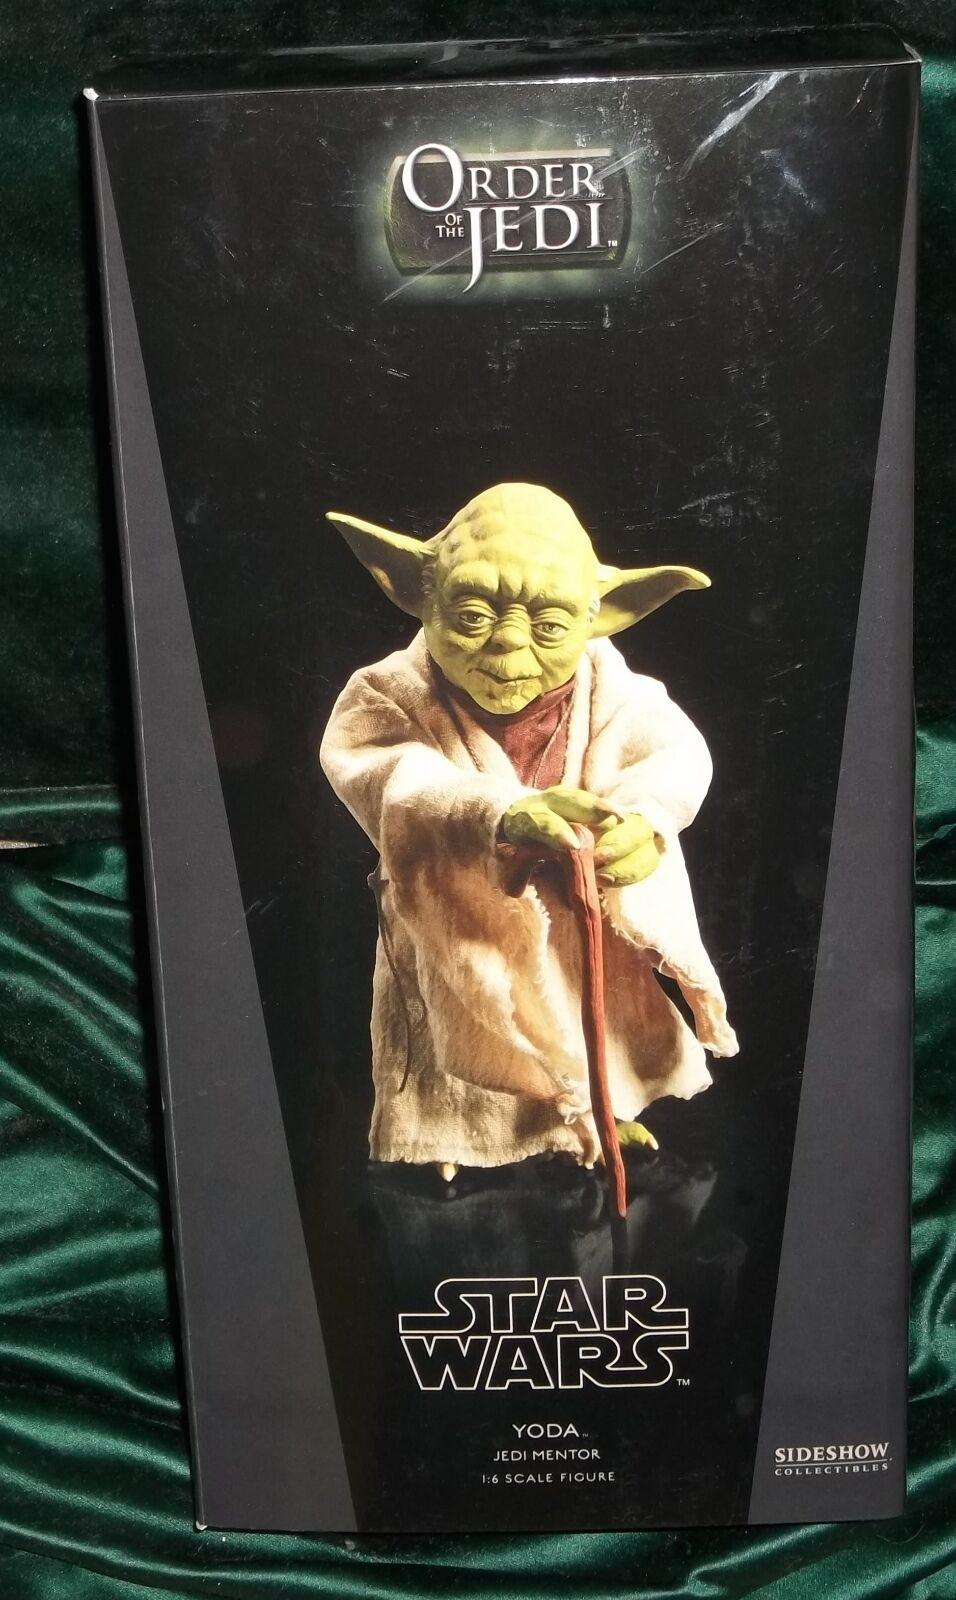 Star wars sideshow 12  1 6 scale jedi master yoda  figure